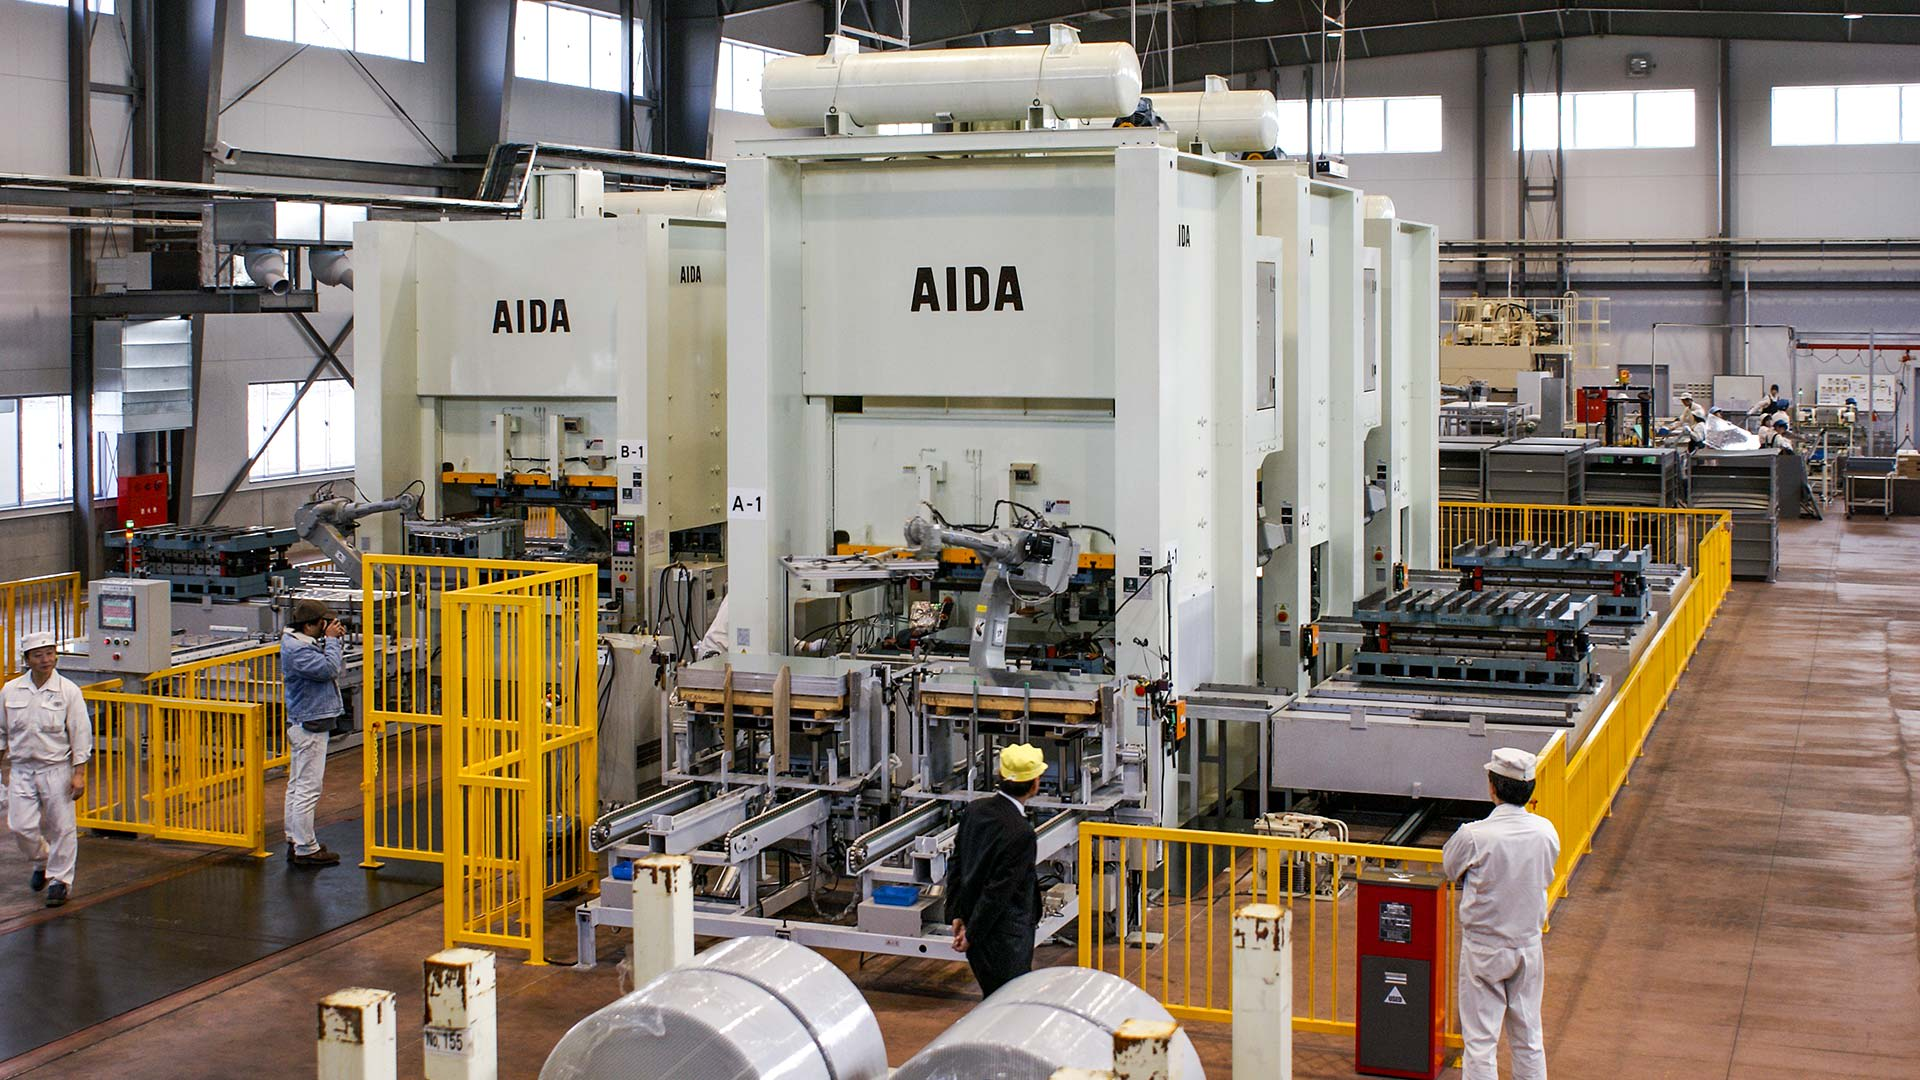 AIDA Mechanical Presses, Unitized Frame | NS2 | Stamping Press